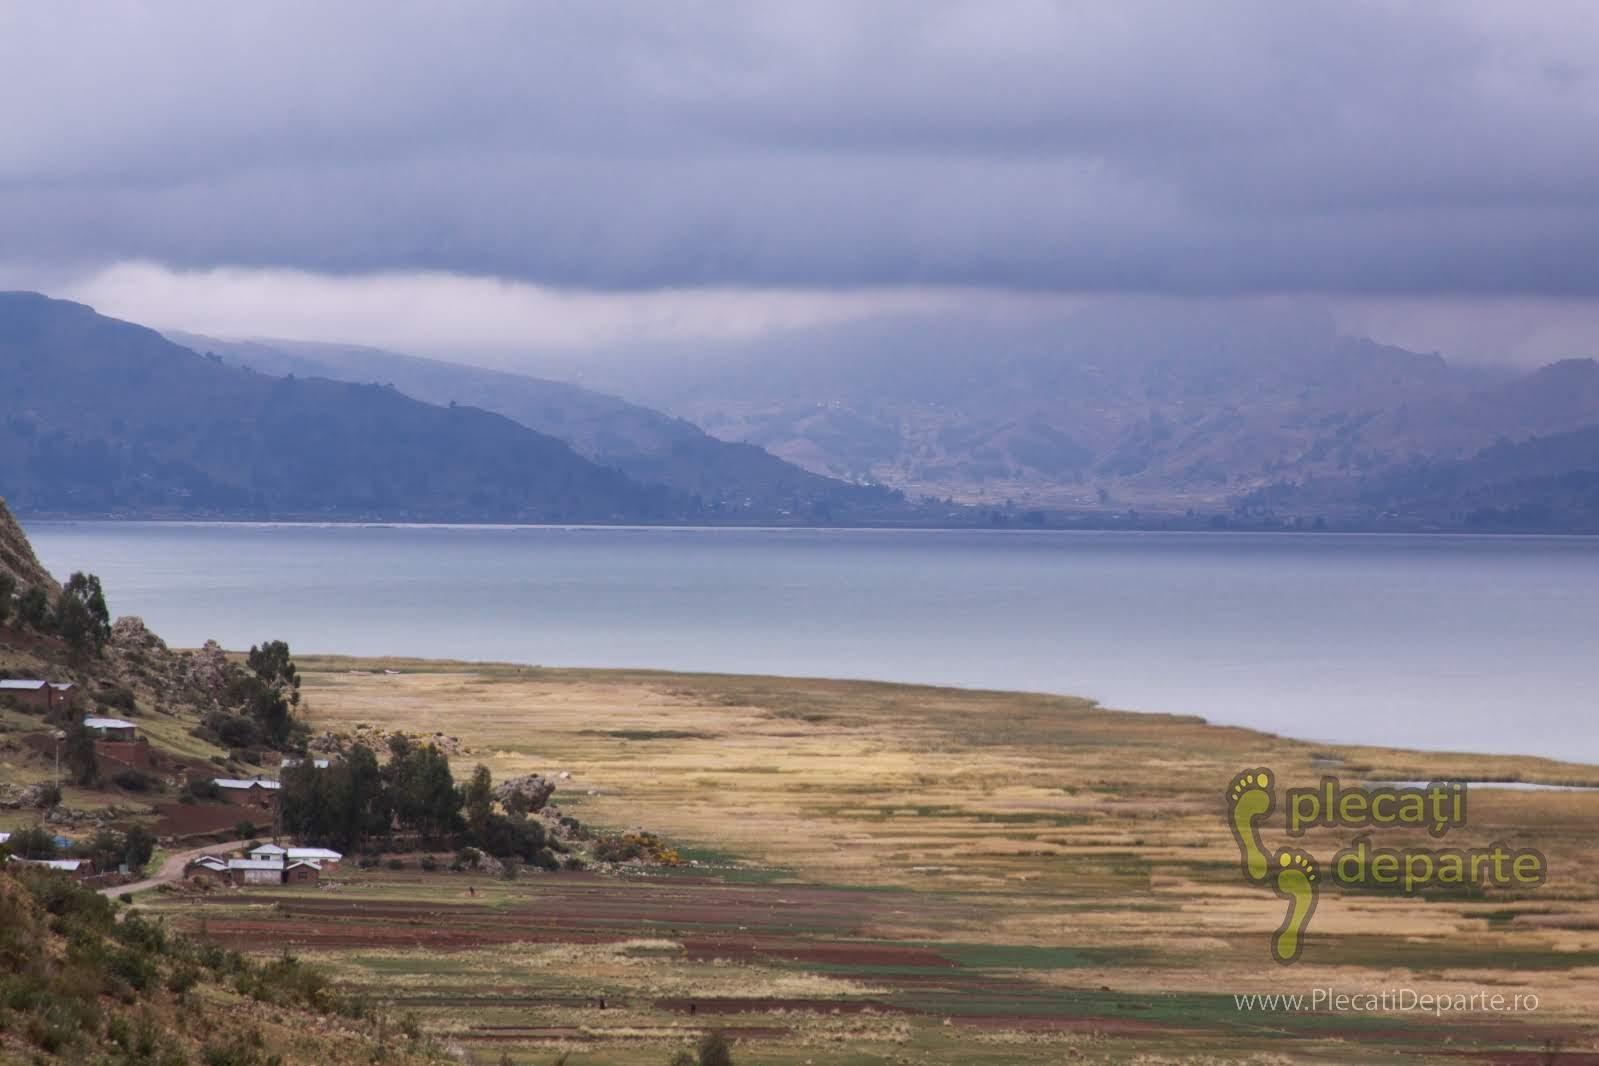 Pe malul Lacului Titicaca, la 4000m, din fata casei in care am stat, din Laquina Chico, Peru